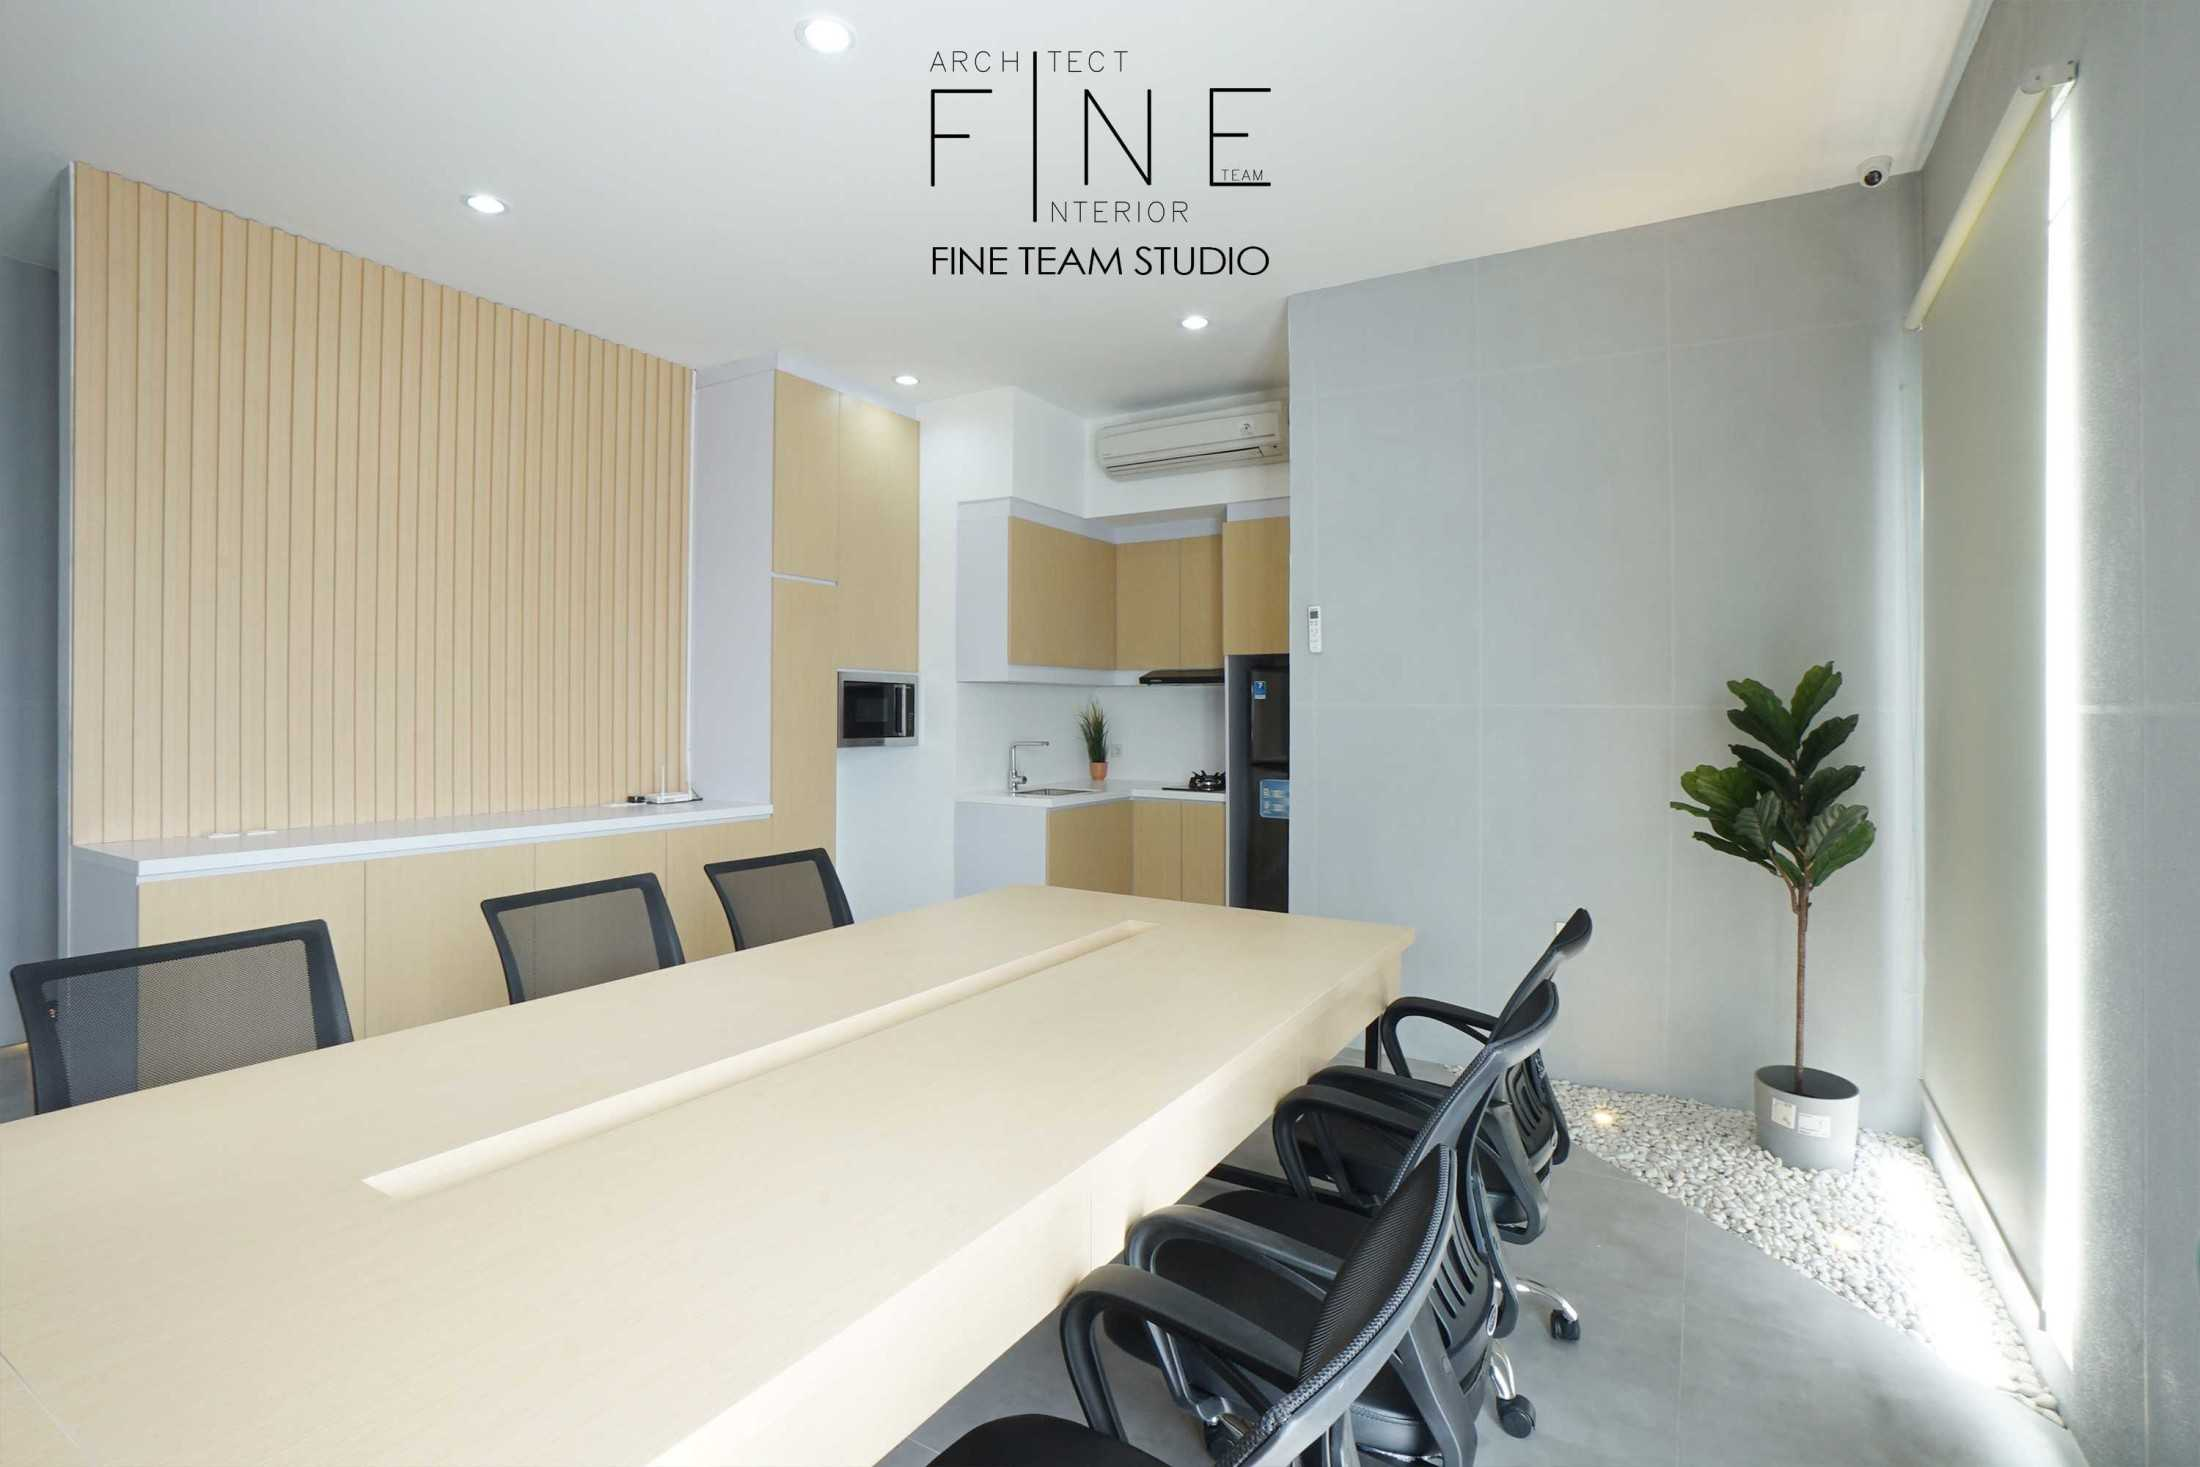 Fine Team Studio Mob Office Cikupa, Tangerang, Banten, Indonesia Cikupa, Tangerang, Banten, Indonesia Fine-Team-Studio-Mob-Office  71133